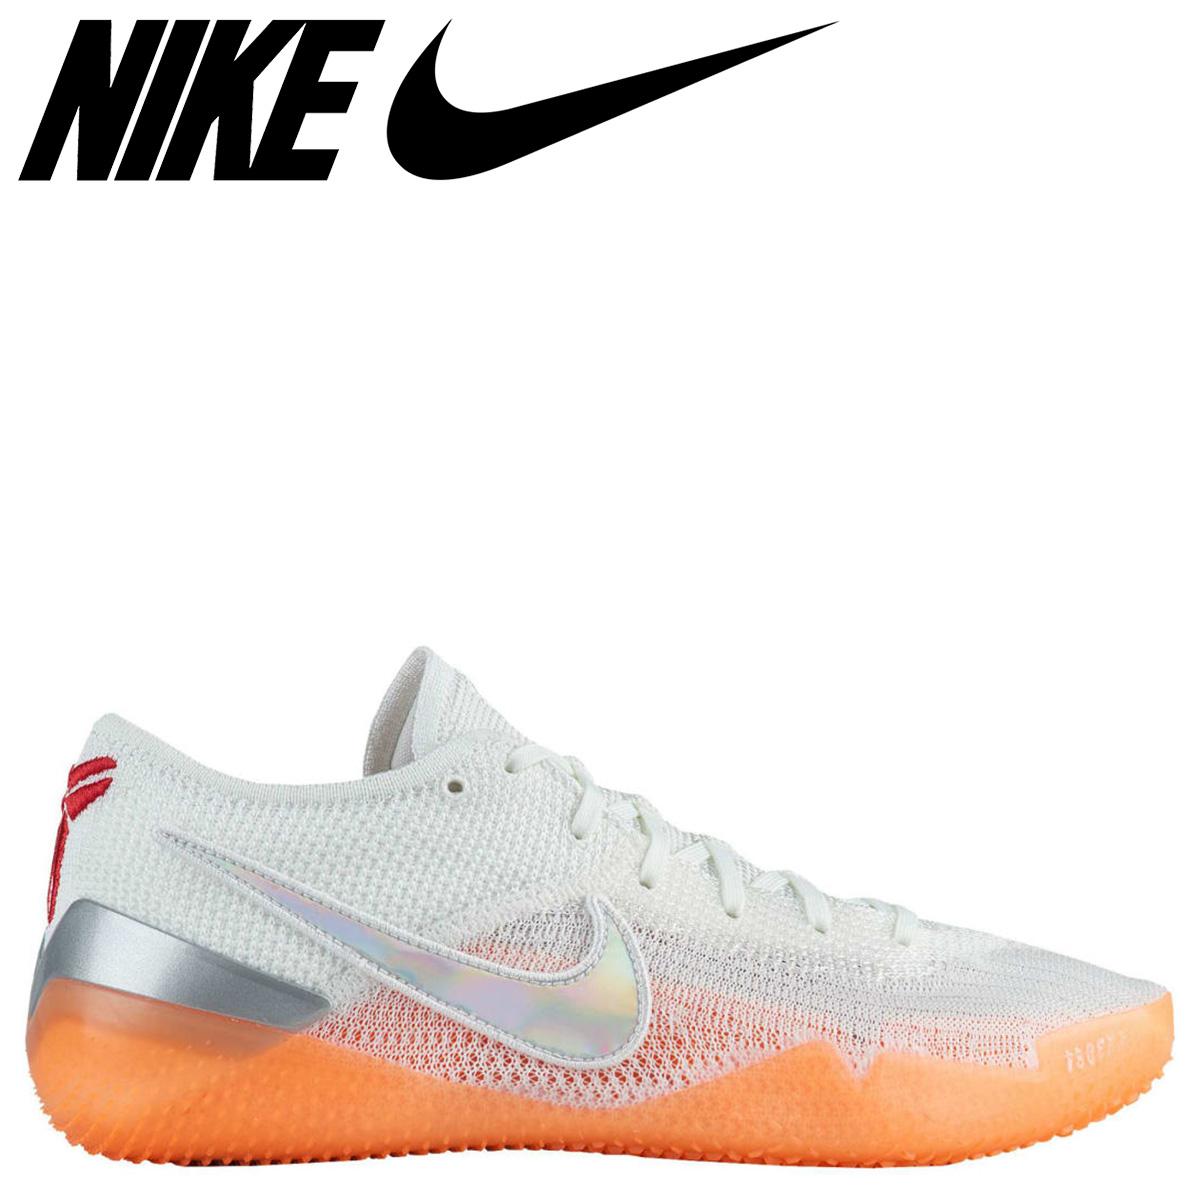 Nike NIKE Corby sneakers men KOBE AD NXT 360 white AQ1087-100  2 21 Shinnyu  load  4dafc99b2